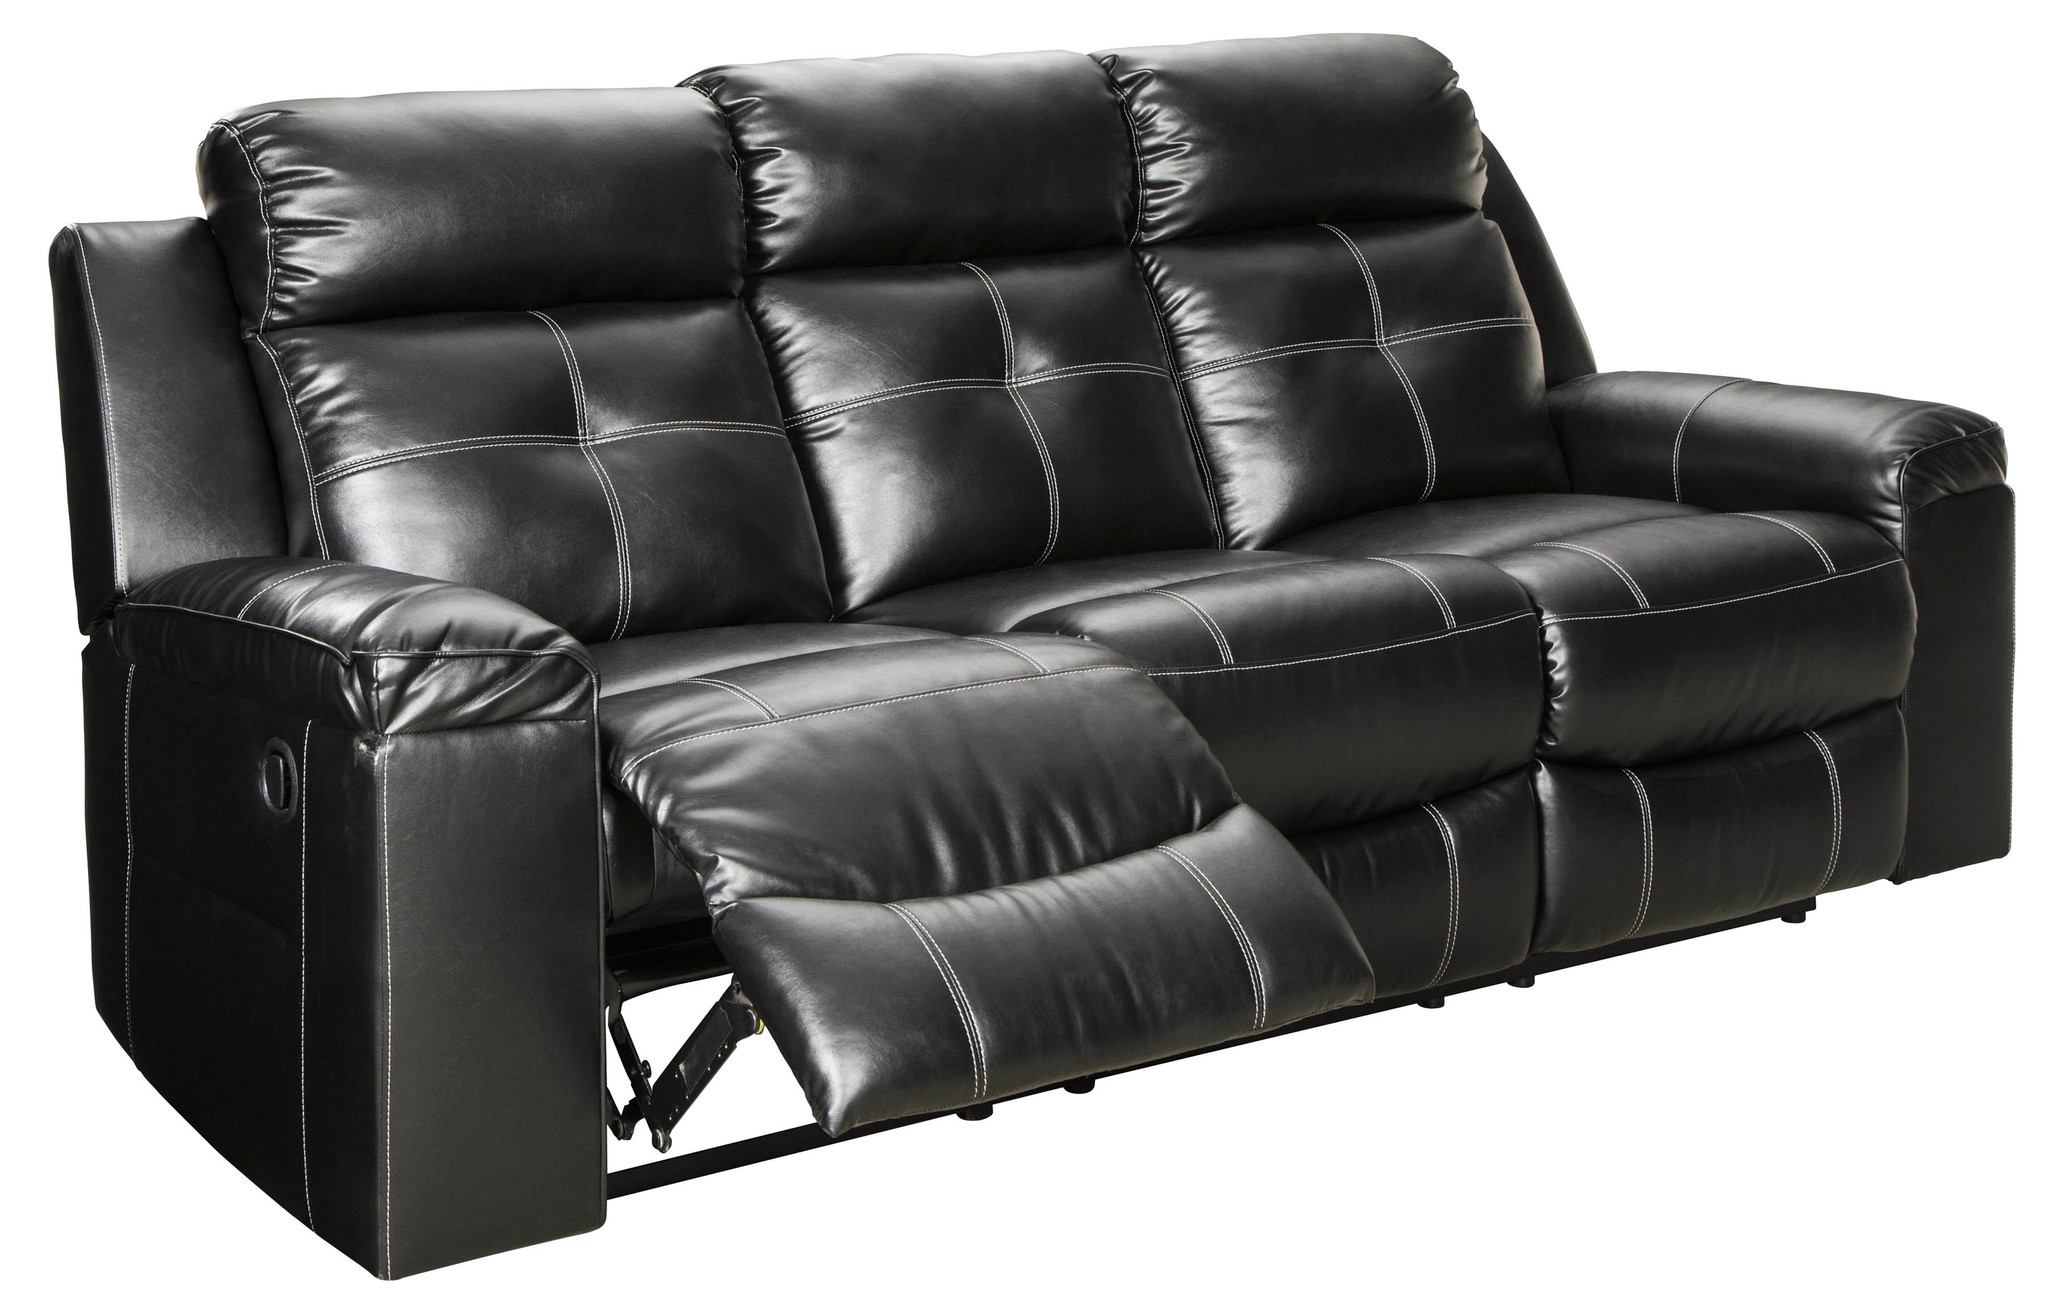 Brilliant 2Pc Kempten Black Sofa And Loveseat Reclining Set Ibusinesslaw Wood Chair Design Ideas Ibusinesslaworg